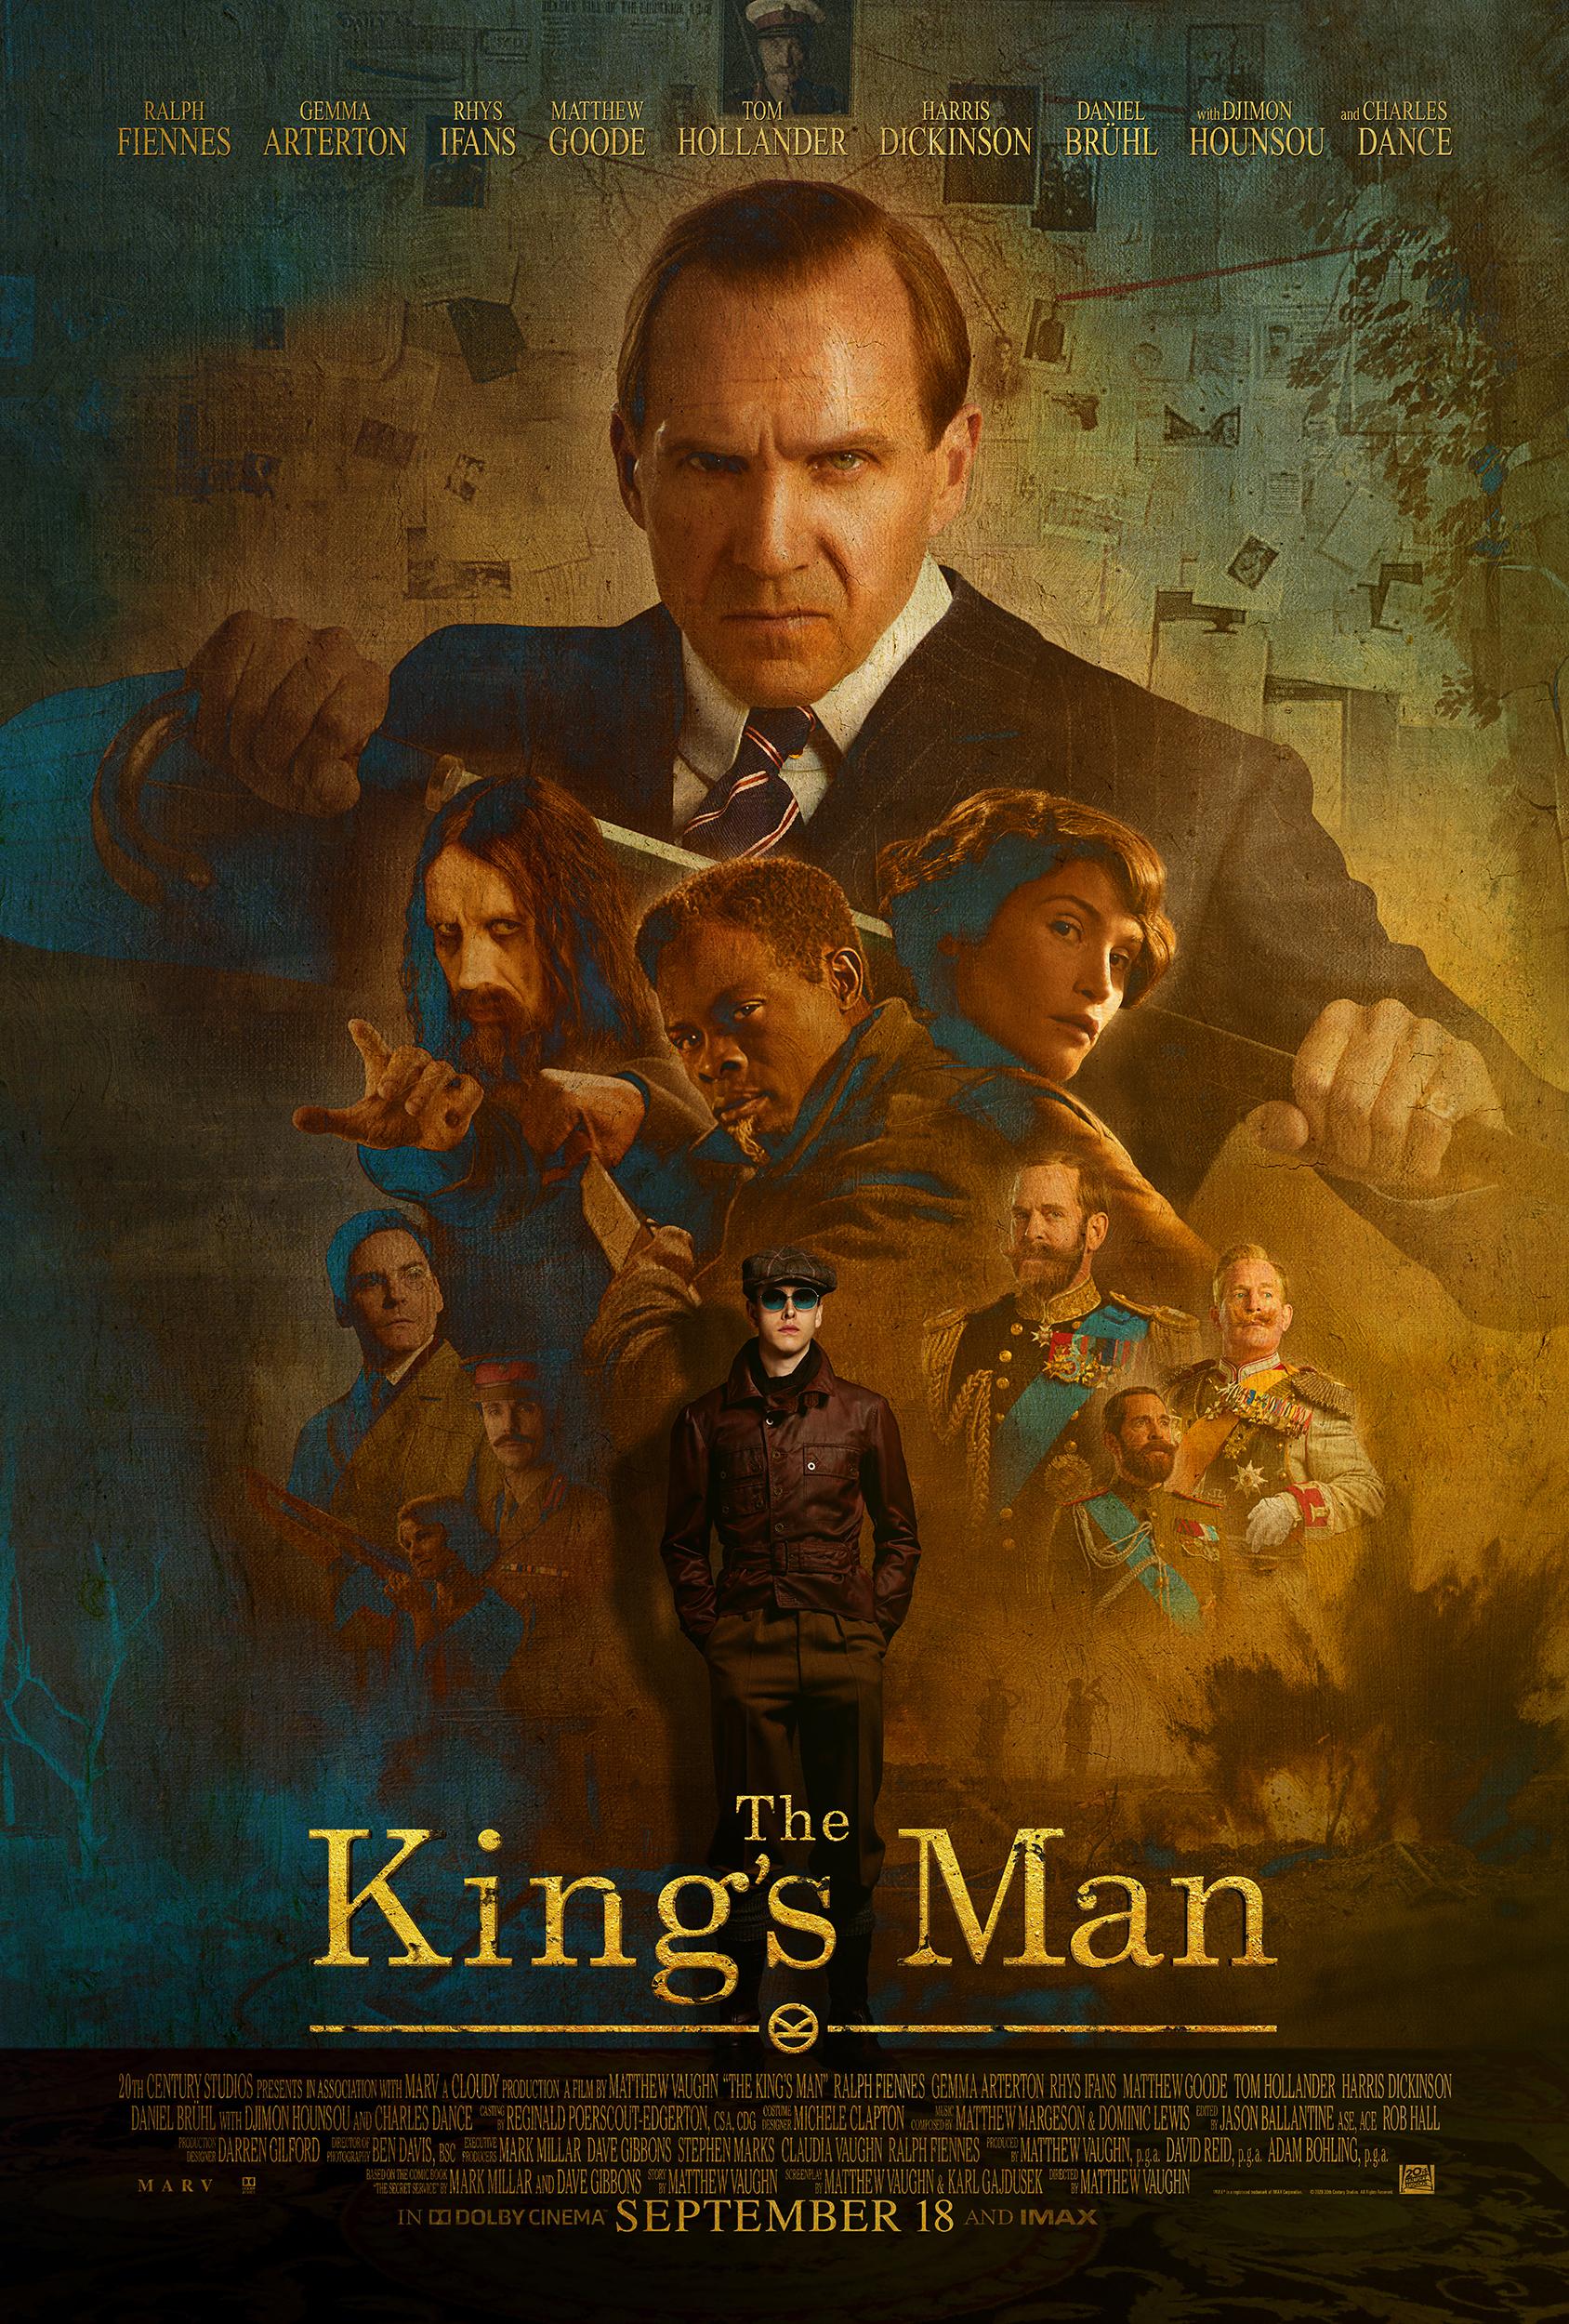 New Movie: The King's Man Starring Ralph Fiennes, Djimon Hounsou